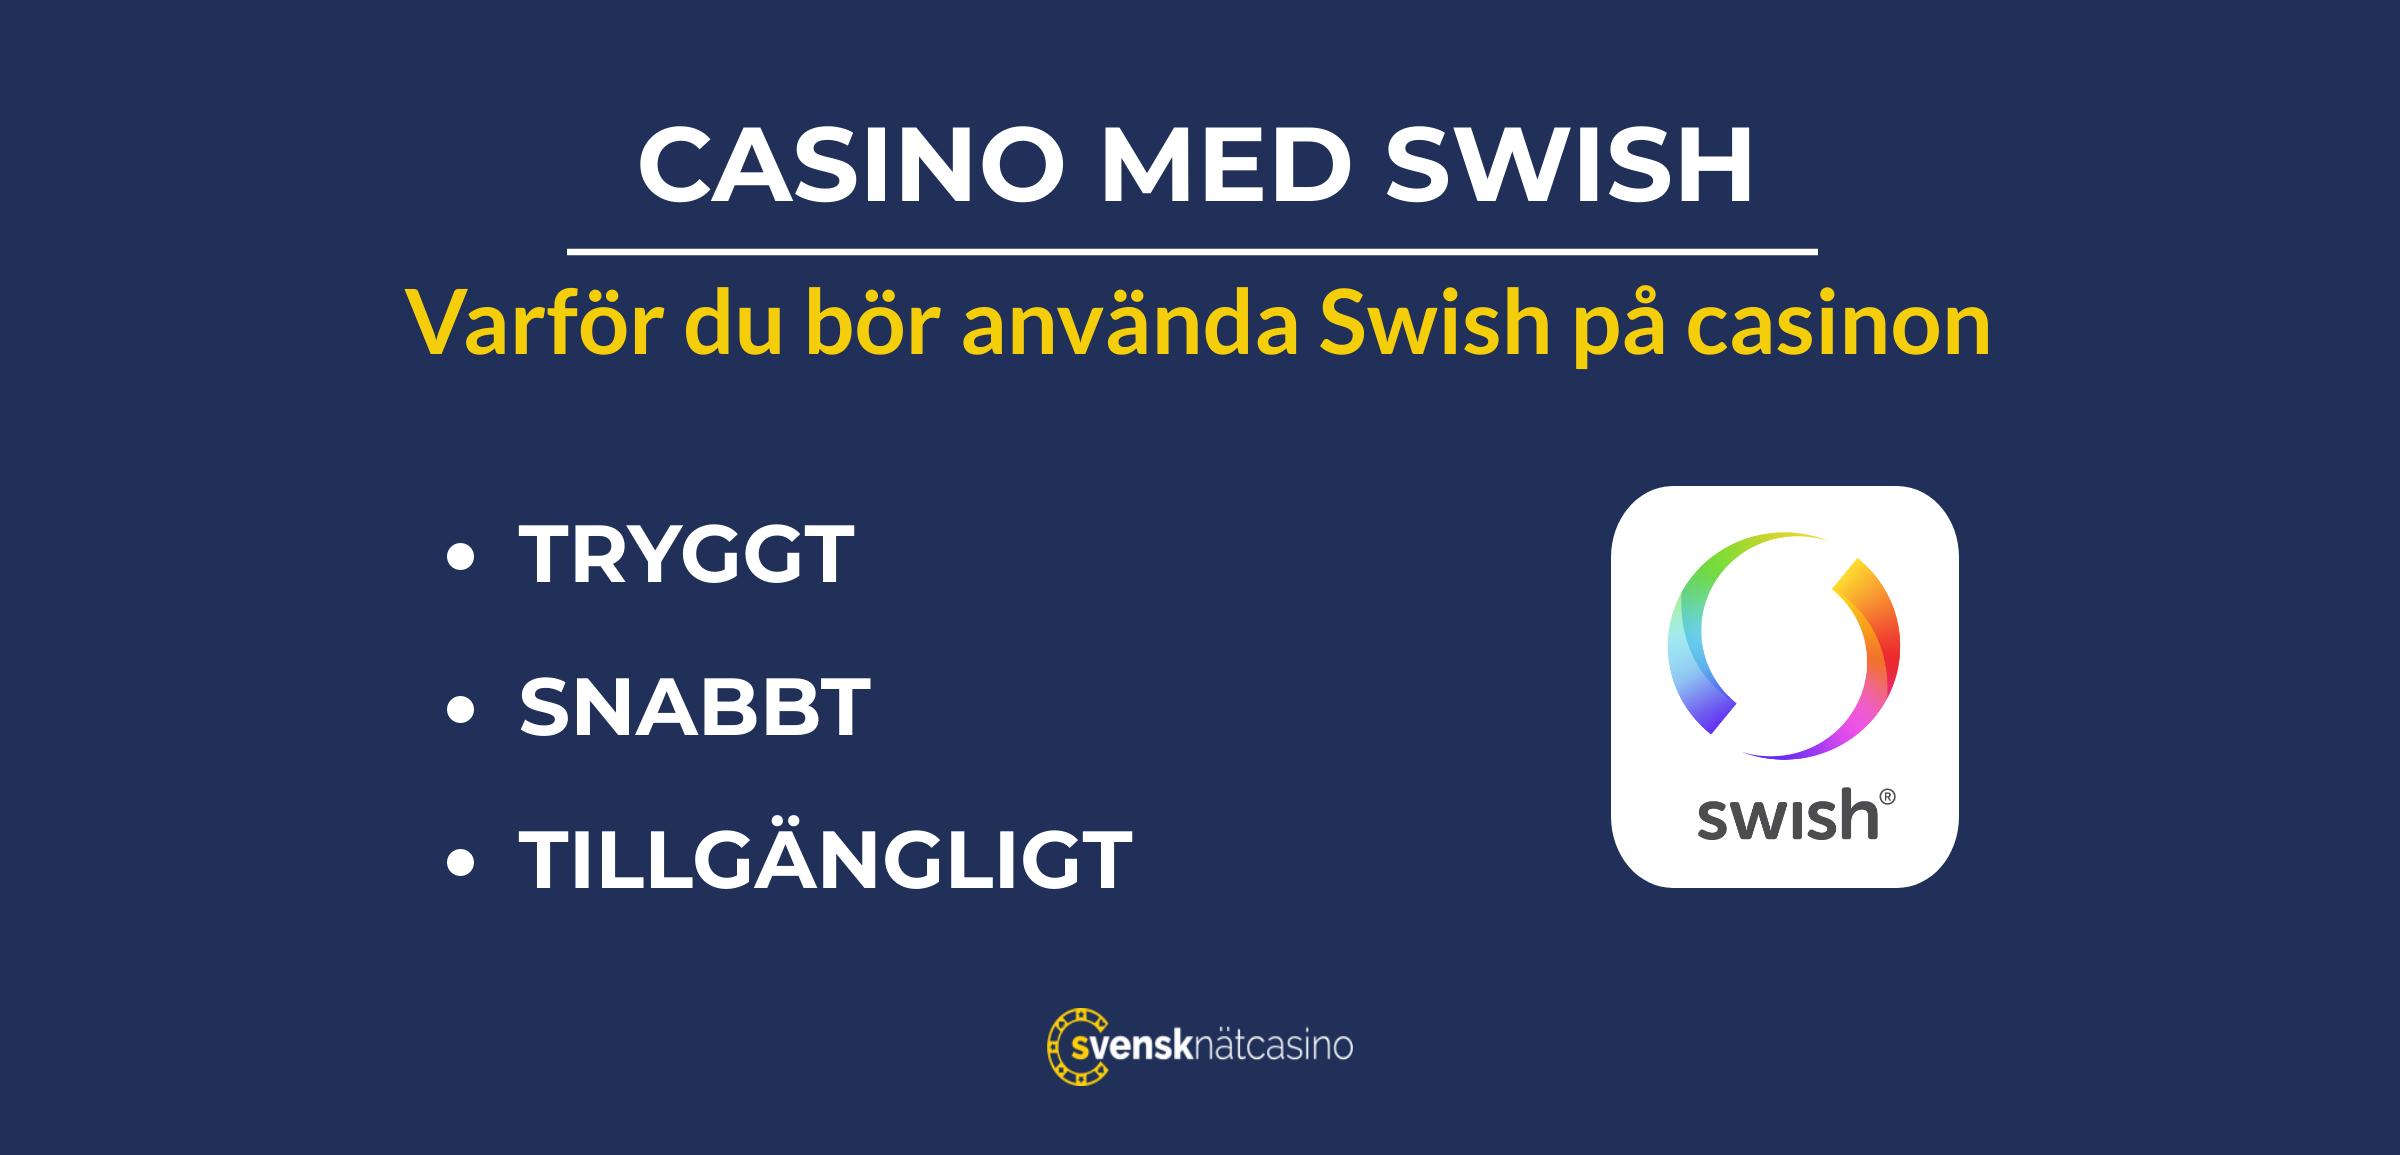 casino med swish varfor svensknatcasino se